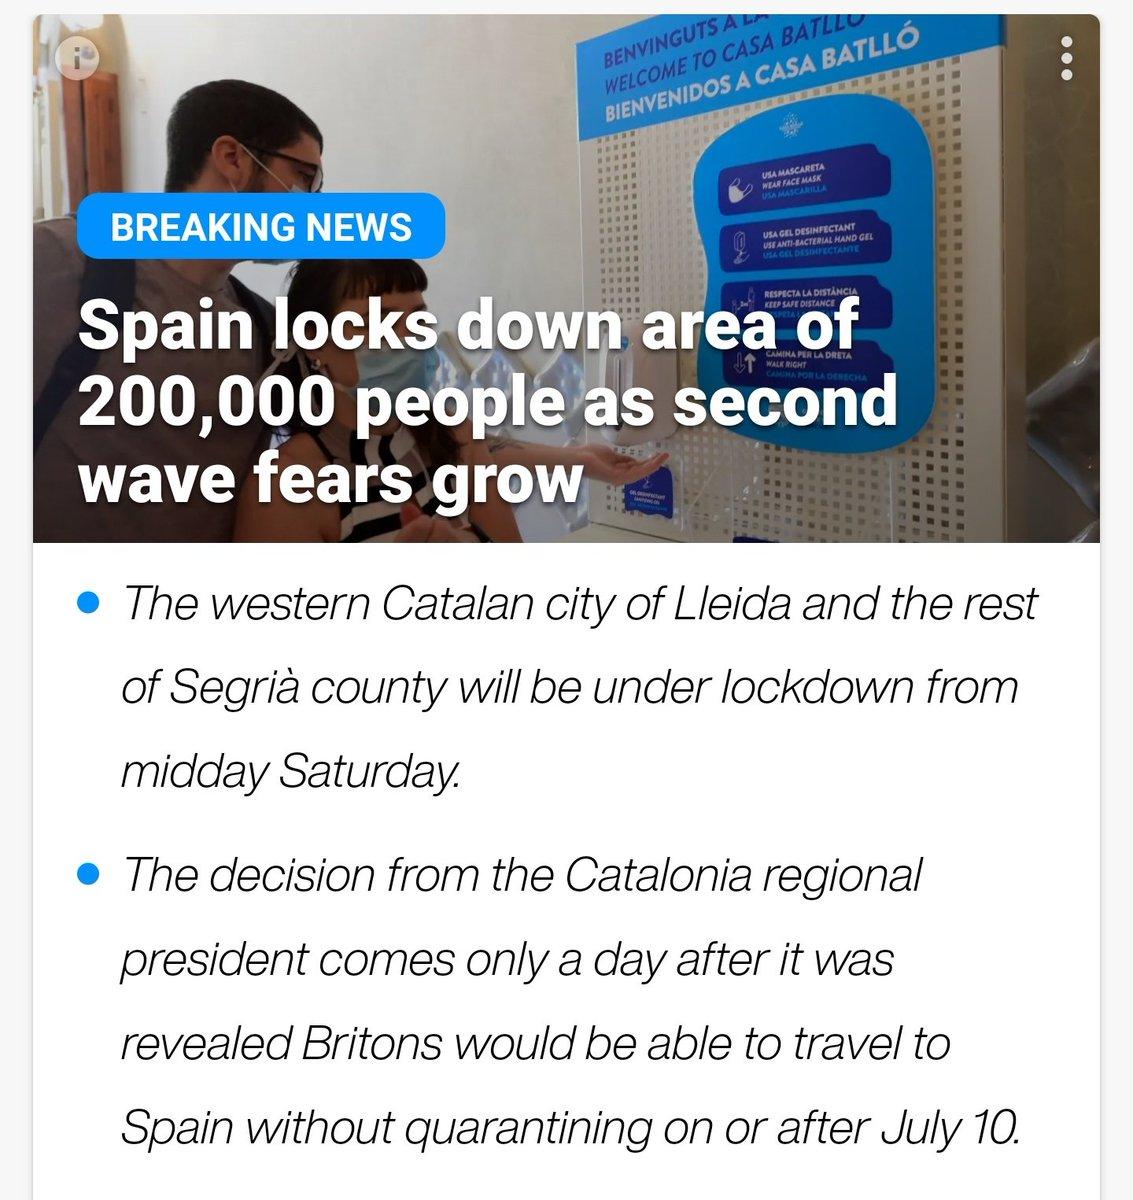 I suspect more of this will occur around Europe. https://t.co/jATtRuFx7T